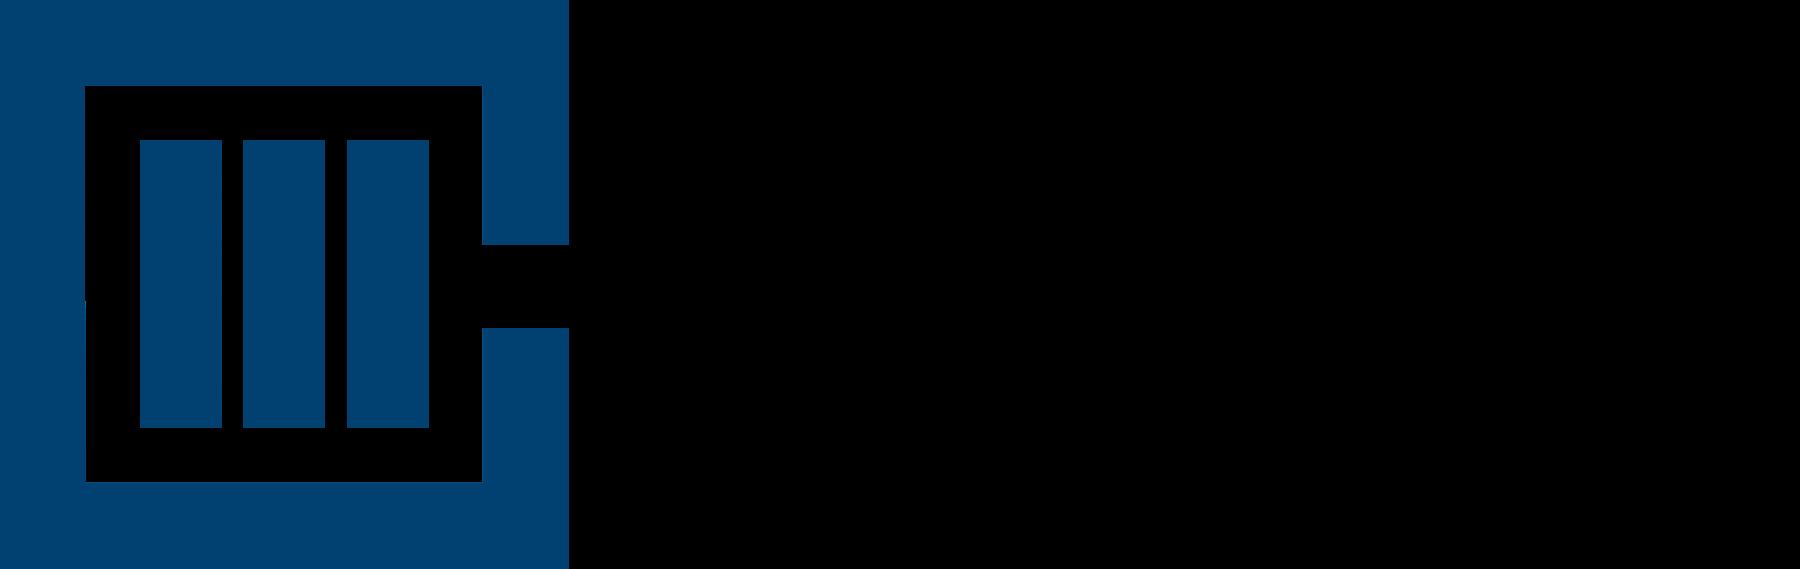 logotipo arges